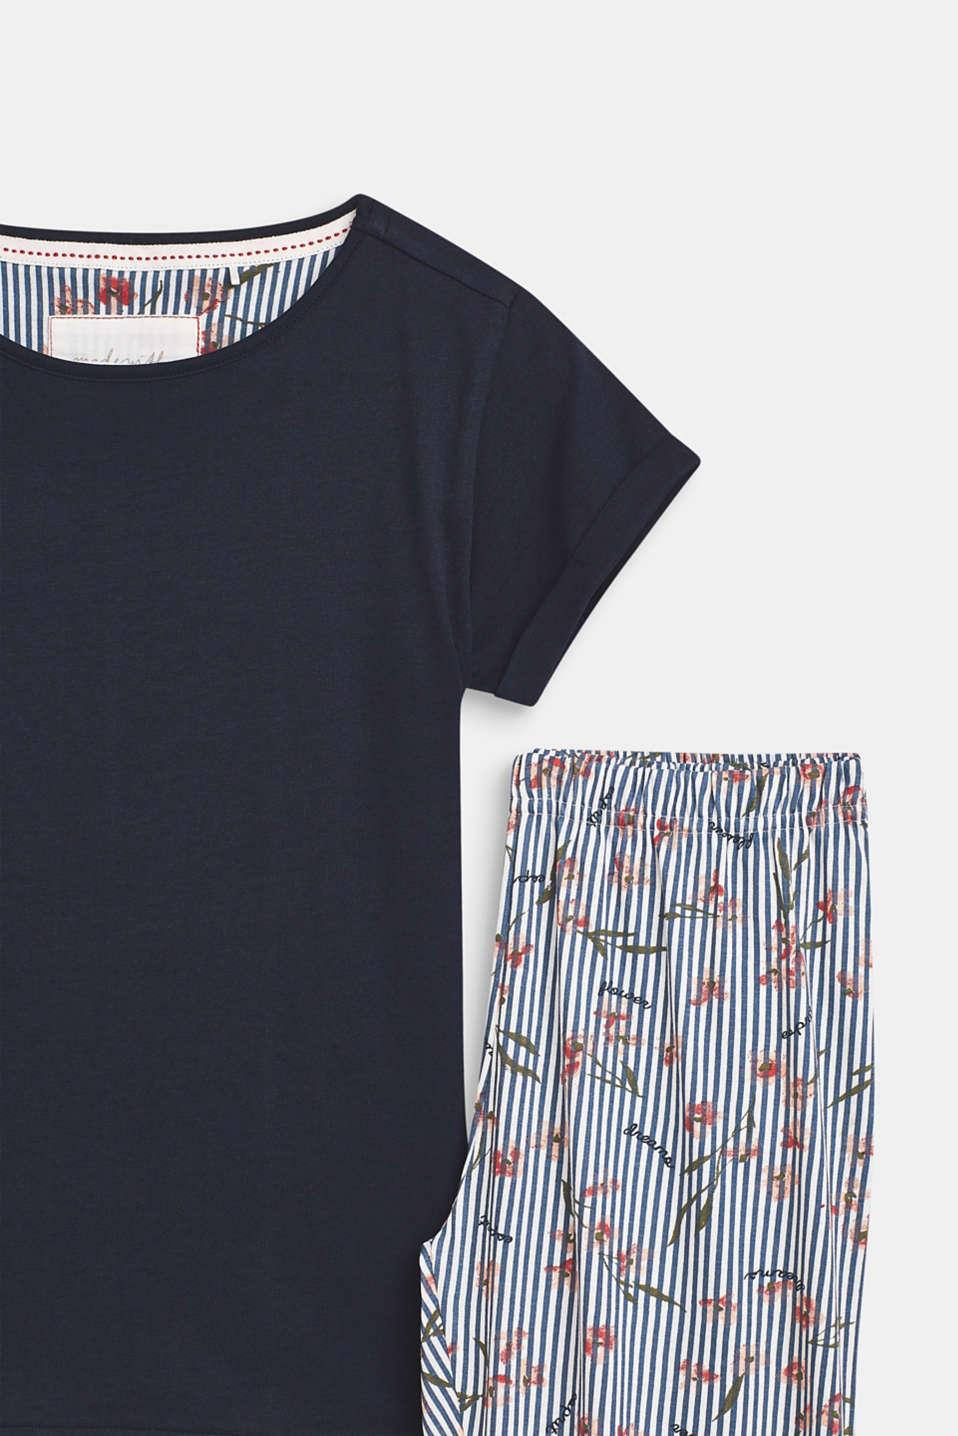 Printed jersey pyjamas, 100% cotton, NAVY, detail image number 2